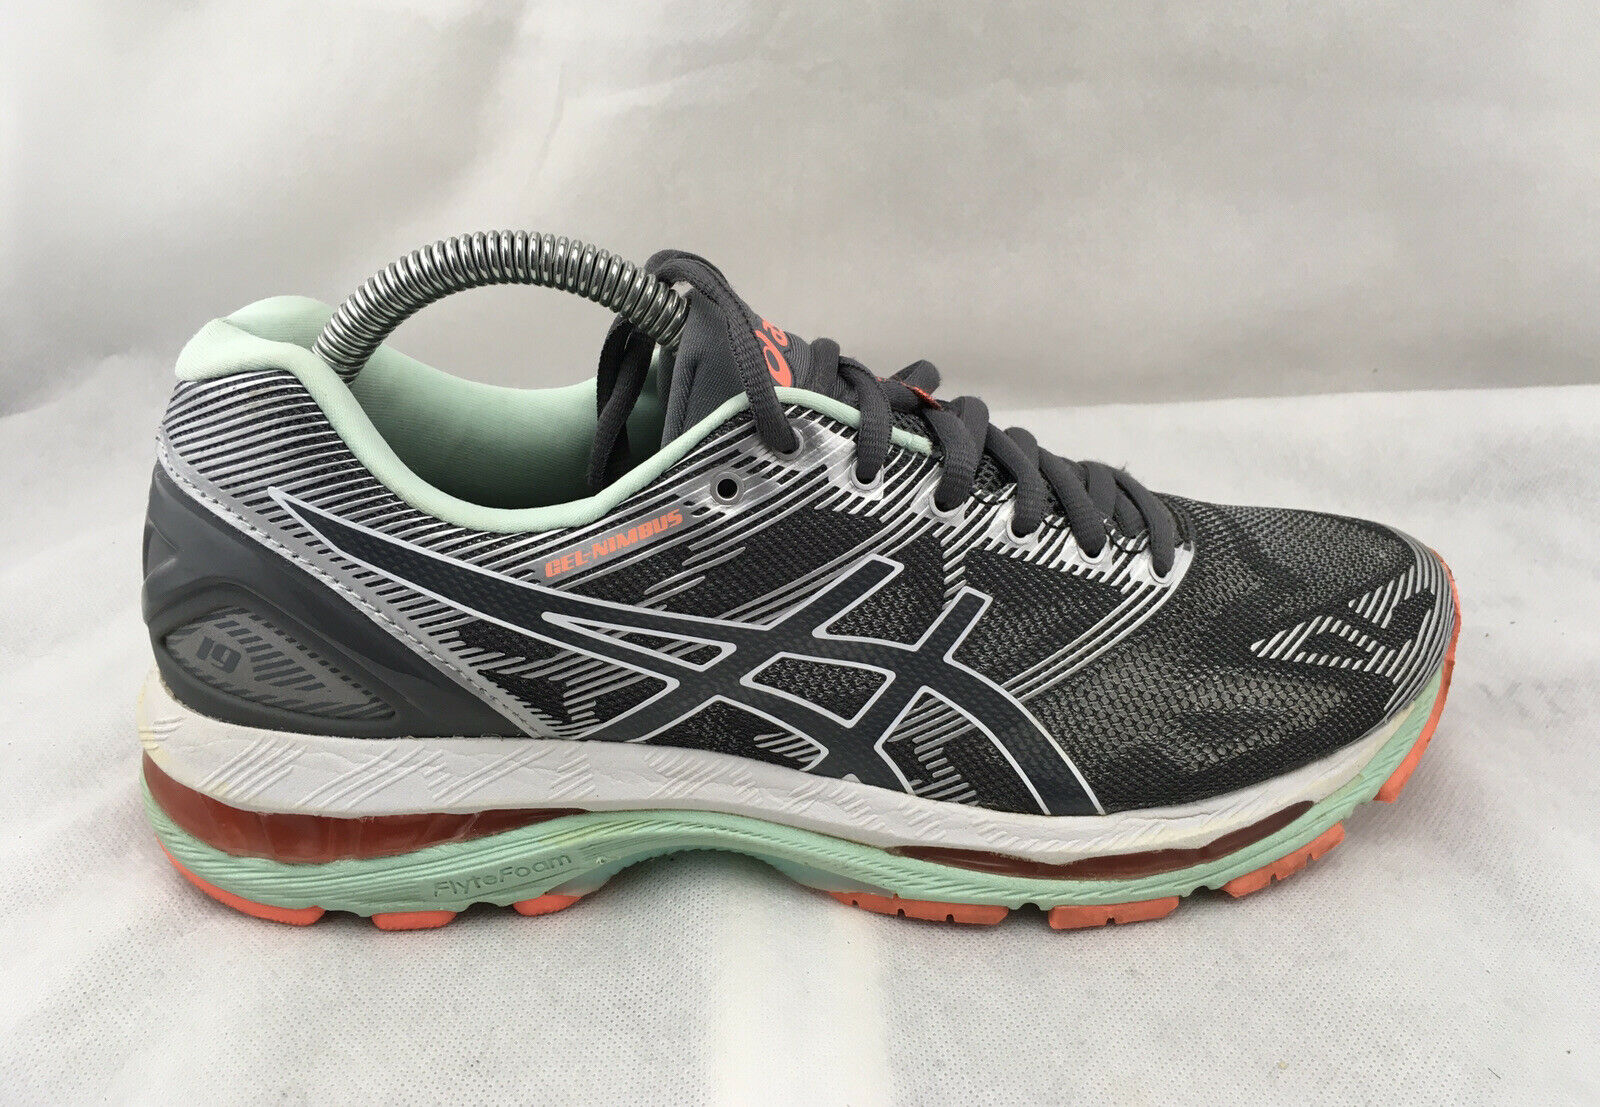 Ascis Gel-Nimbus 19 Running Shoes T753N